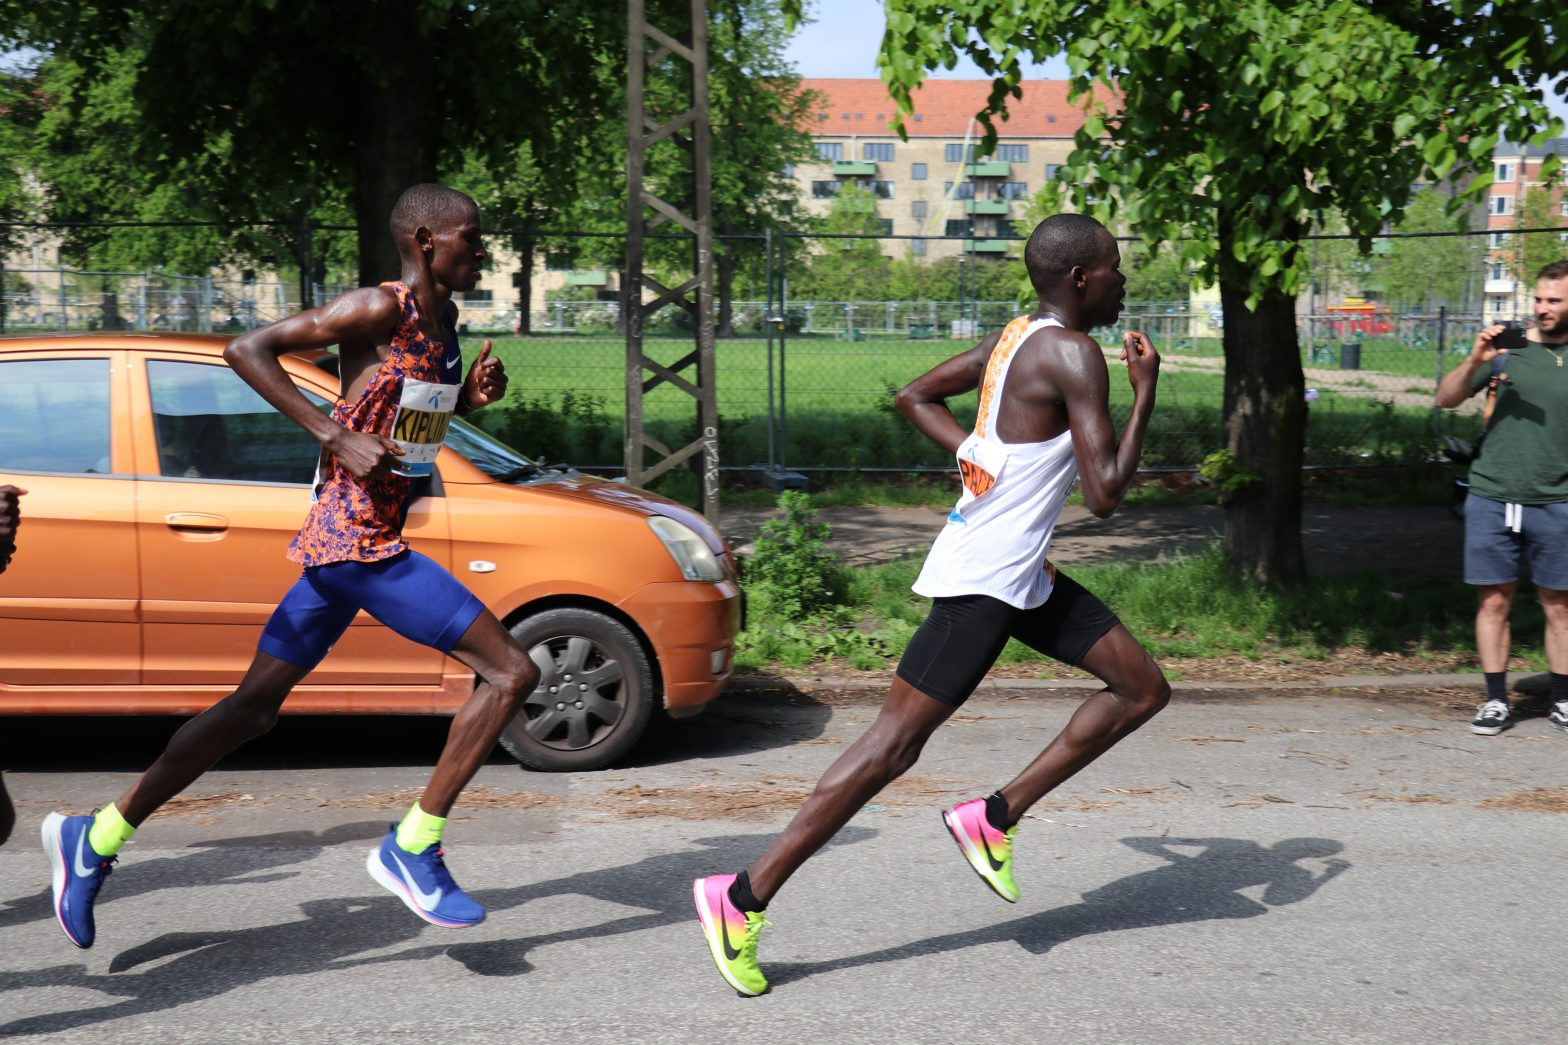 Igen fine tider til klubbens løbere i Copenhagen Marathon 2019